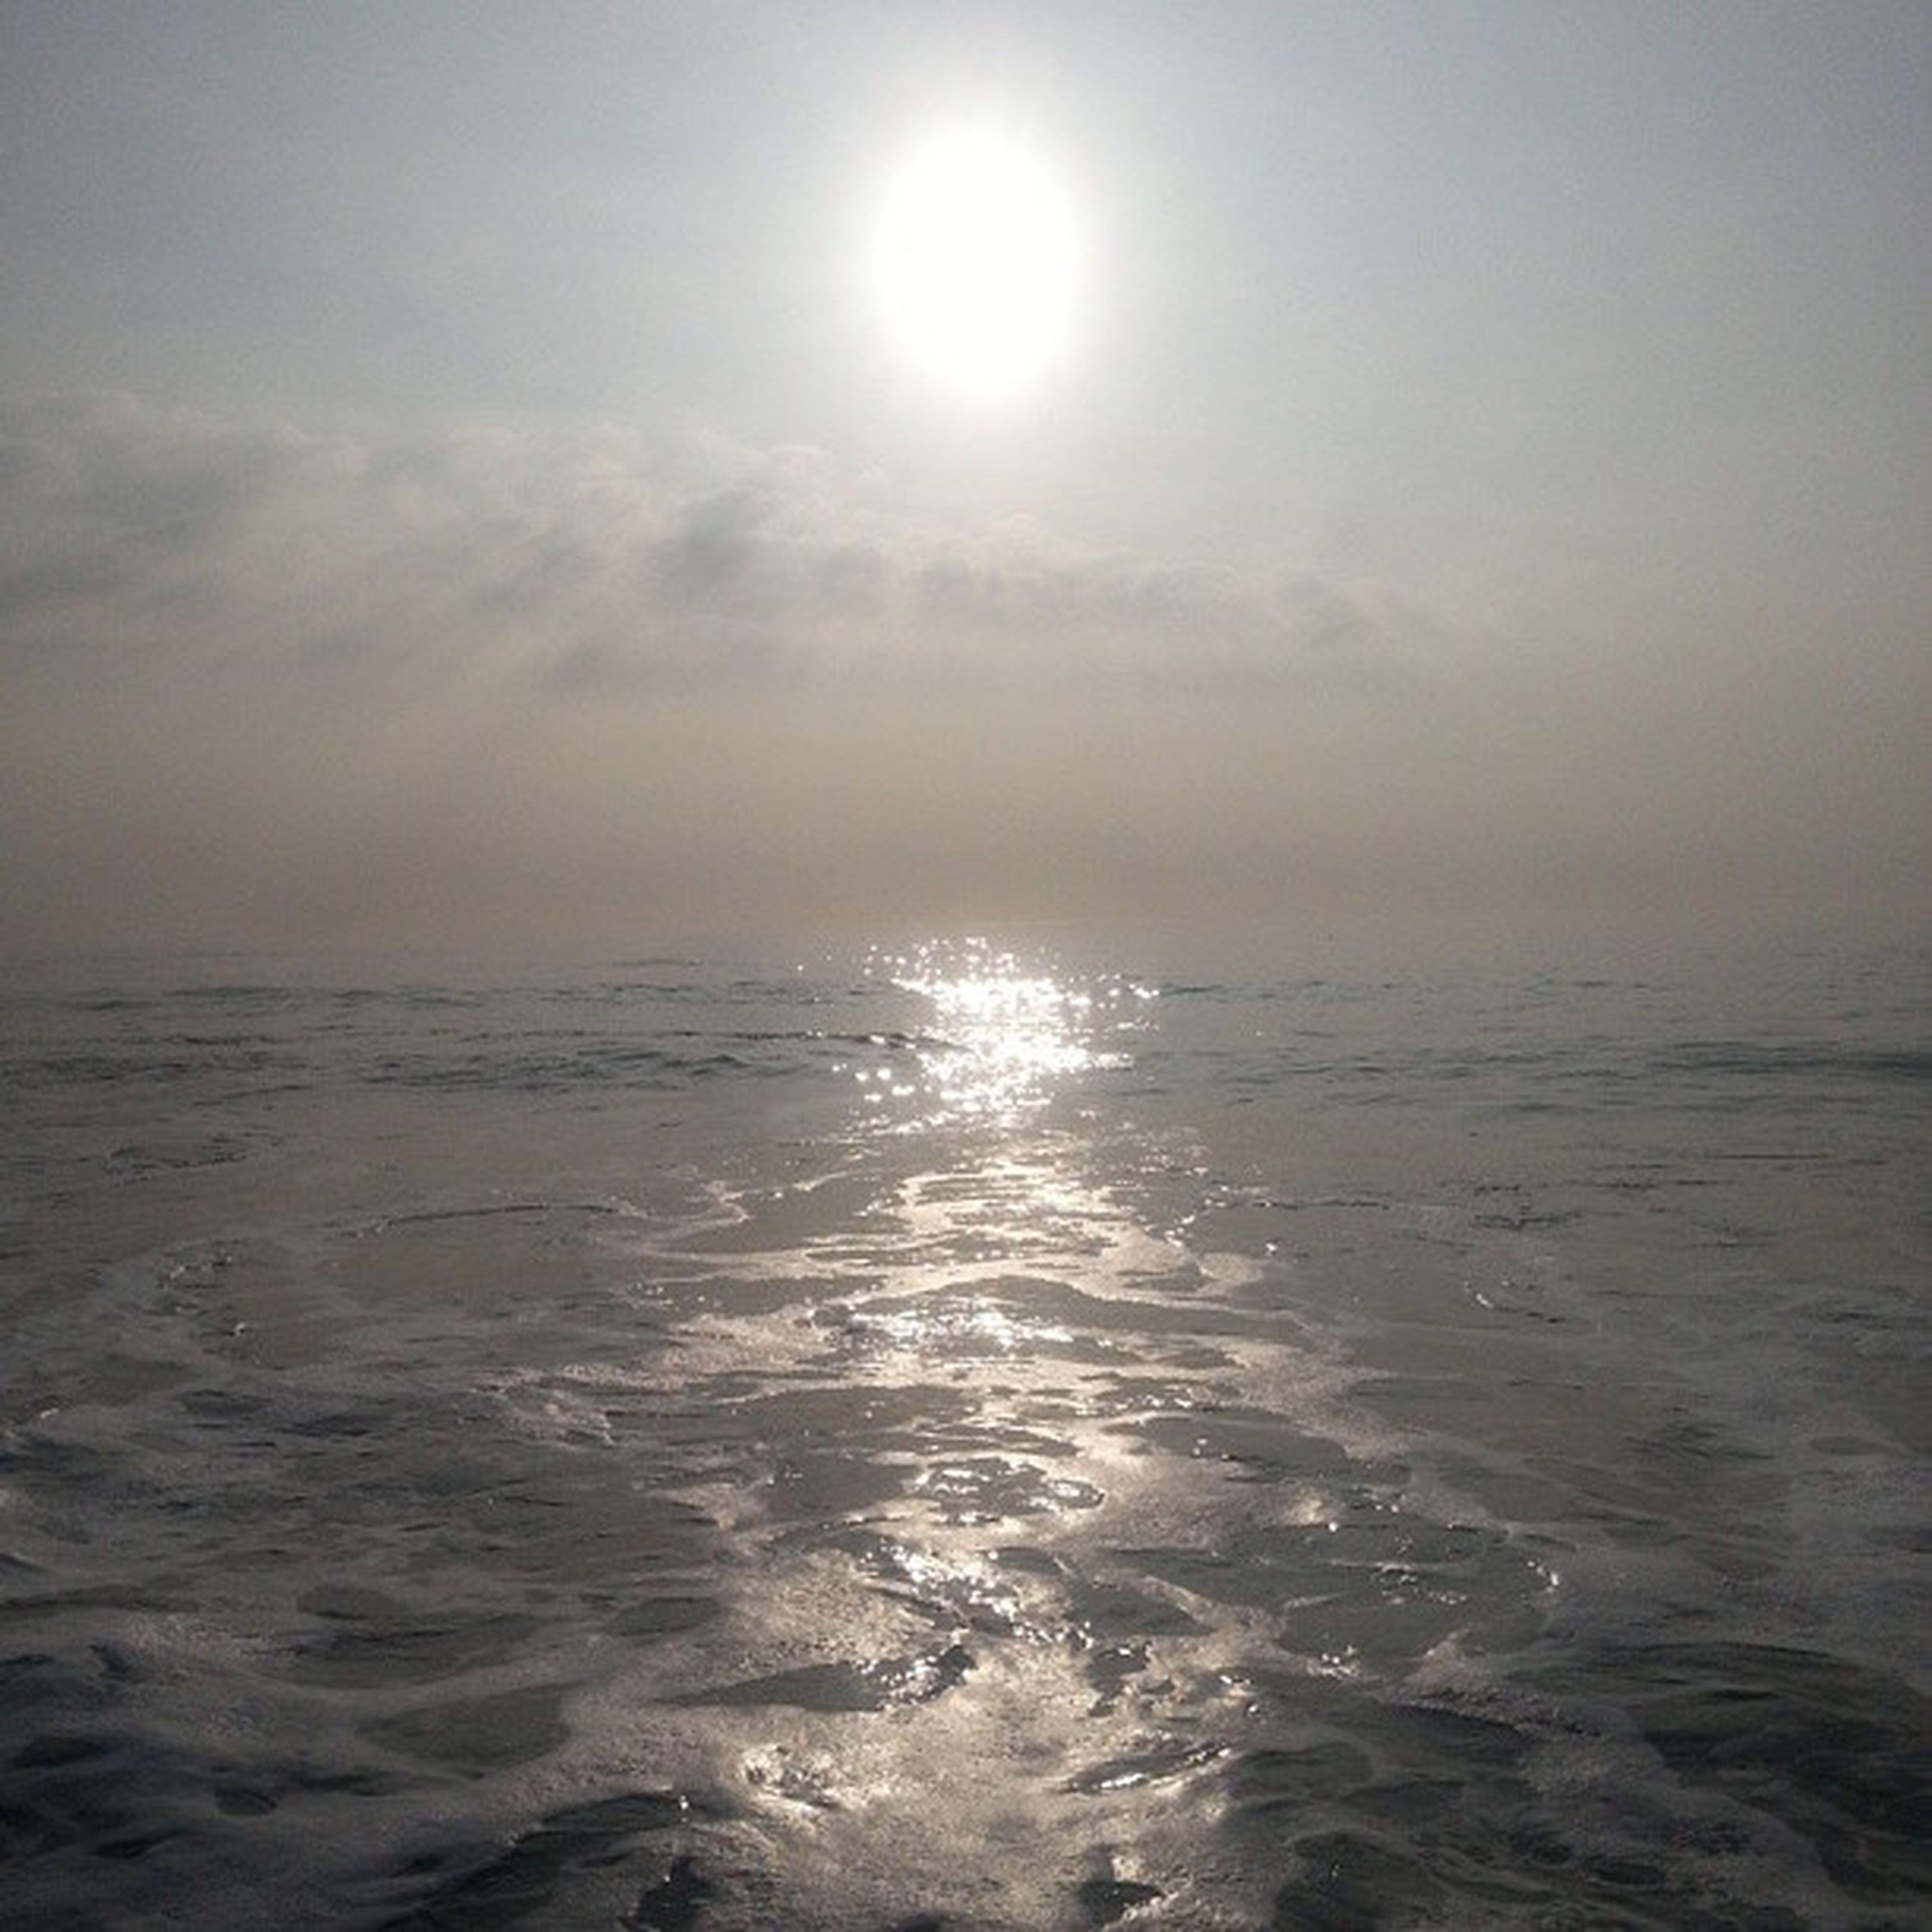 sea, water, sun, horizon over water, scenics, tranquil scene, tranquility, beauty in nature, sky, reflection, sunlight, waterfront, nature, sunbeam, idyllic, seascape, beach, sunset, rippled, lens flare